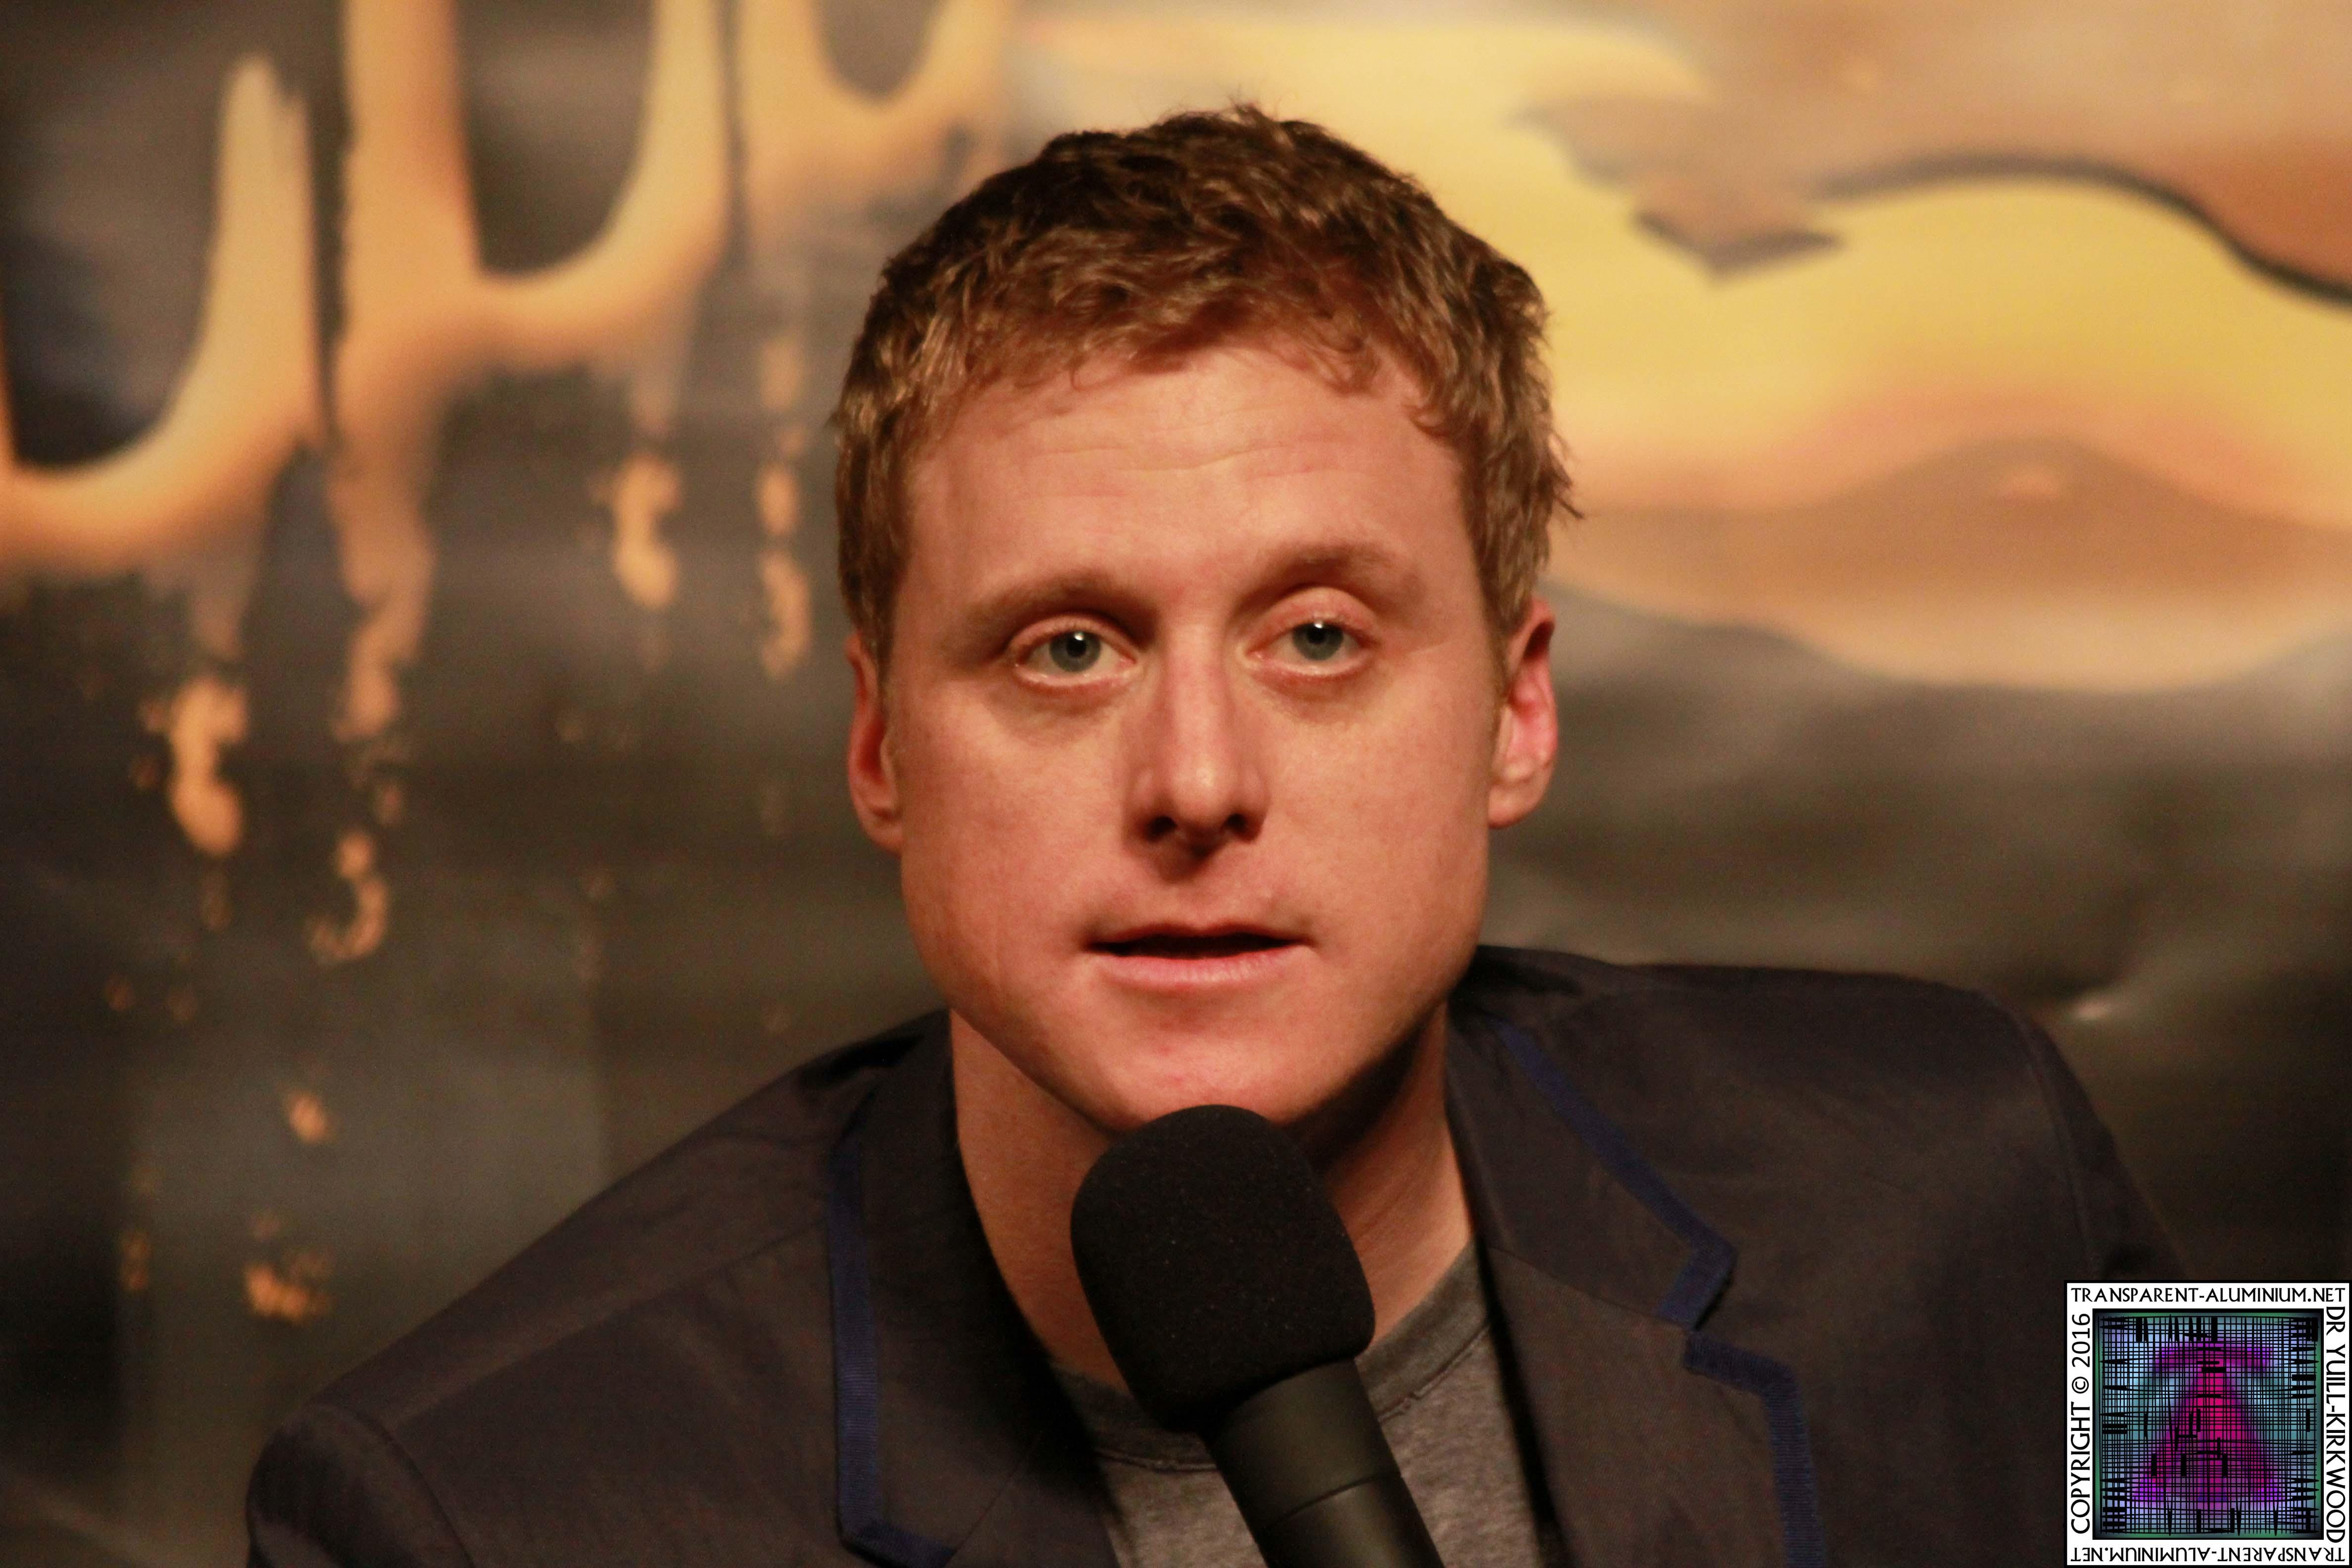 Hallowhedon2 2010 – Saturday: Alan Tudyk